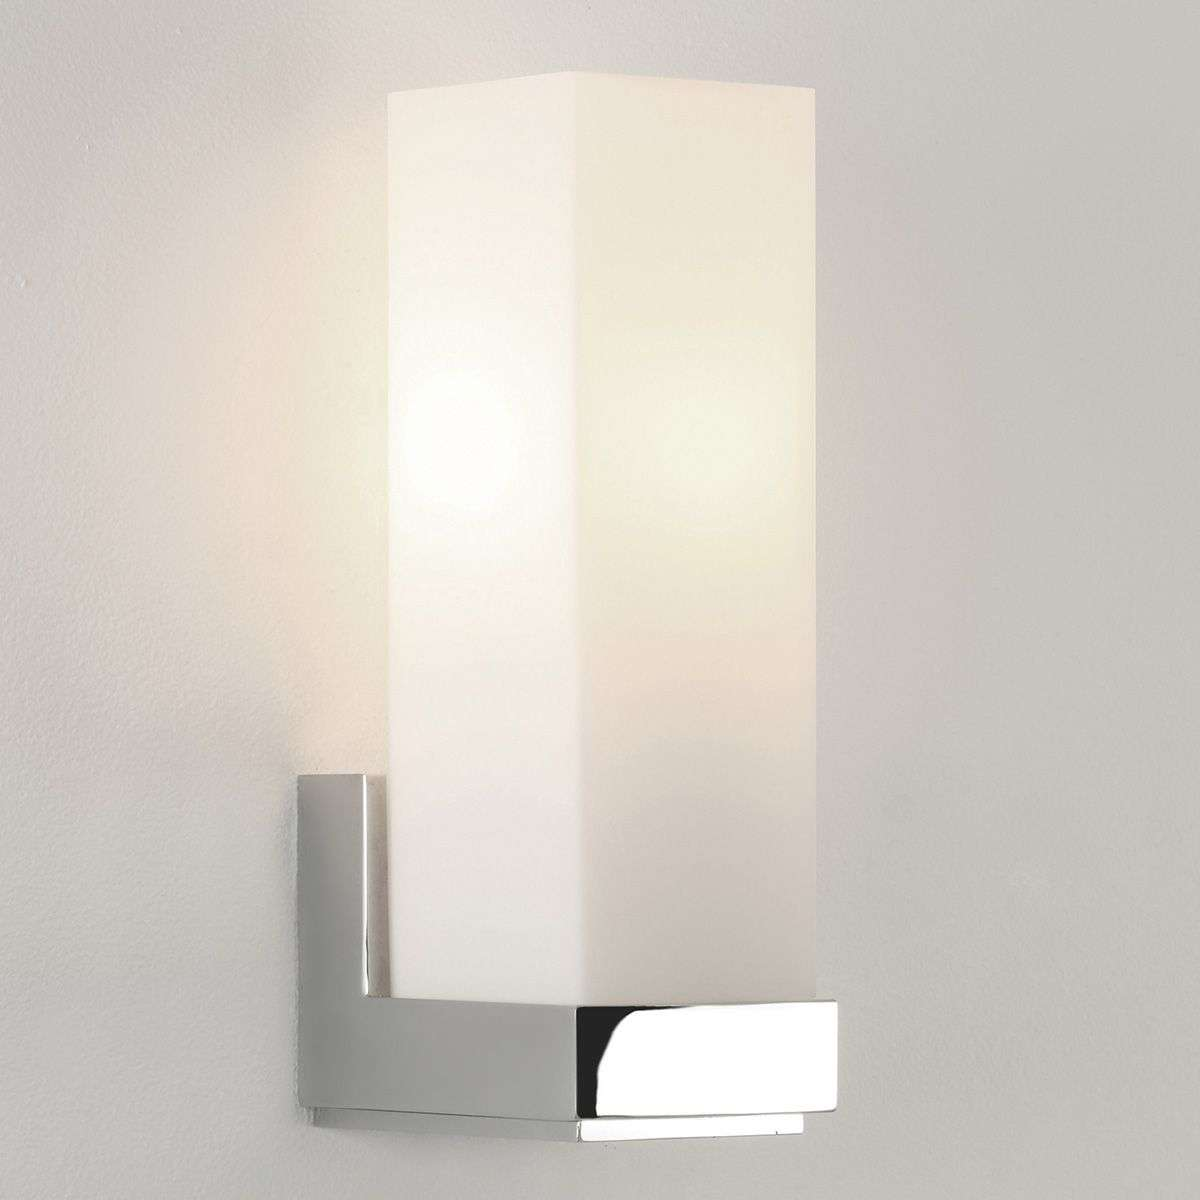 Taketa Wall Light Modern-1020004-32